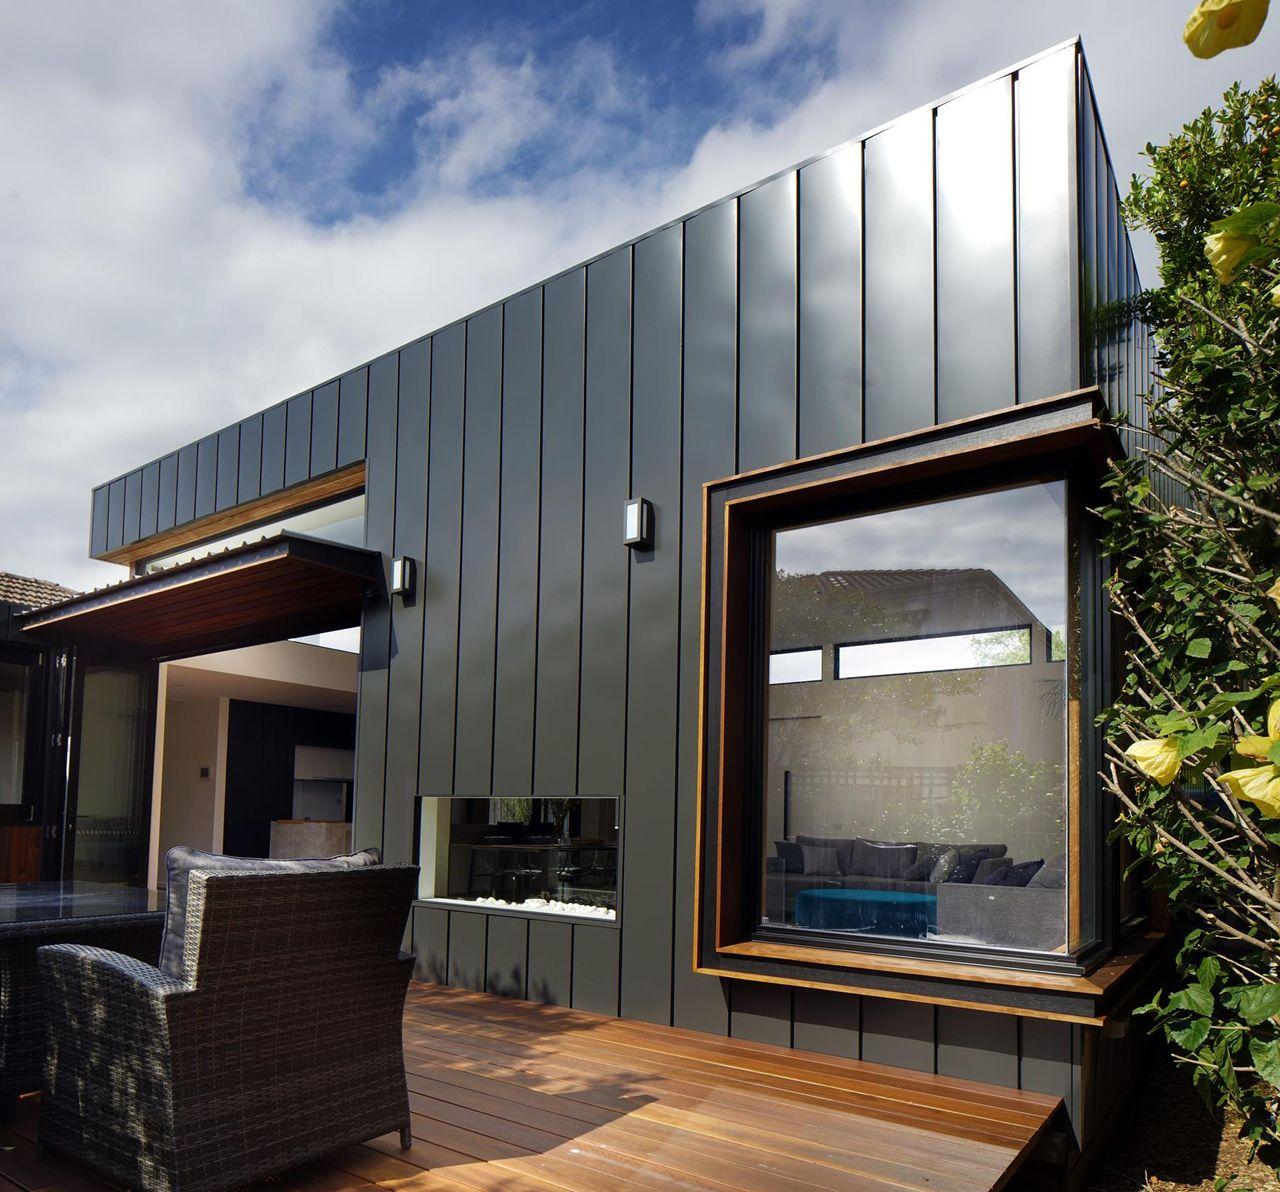 Art Deco Residential: A Renovation Upgrades An Art Deco House